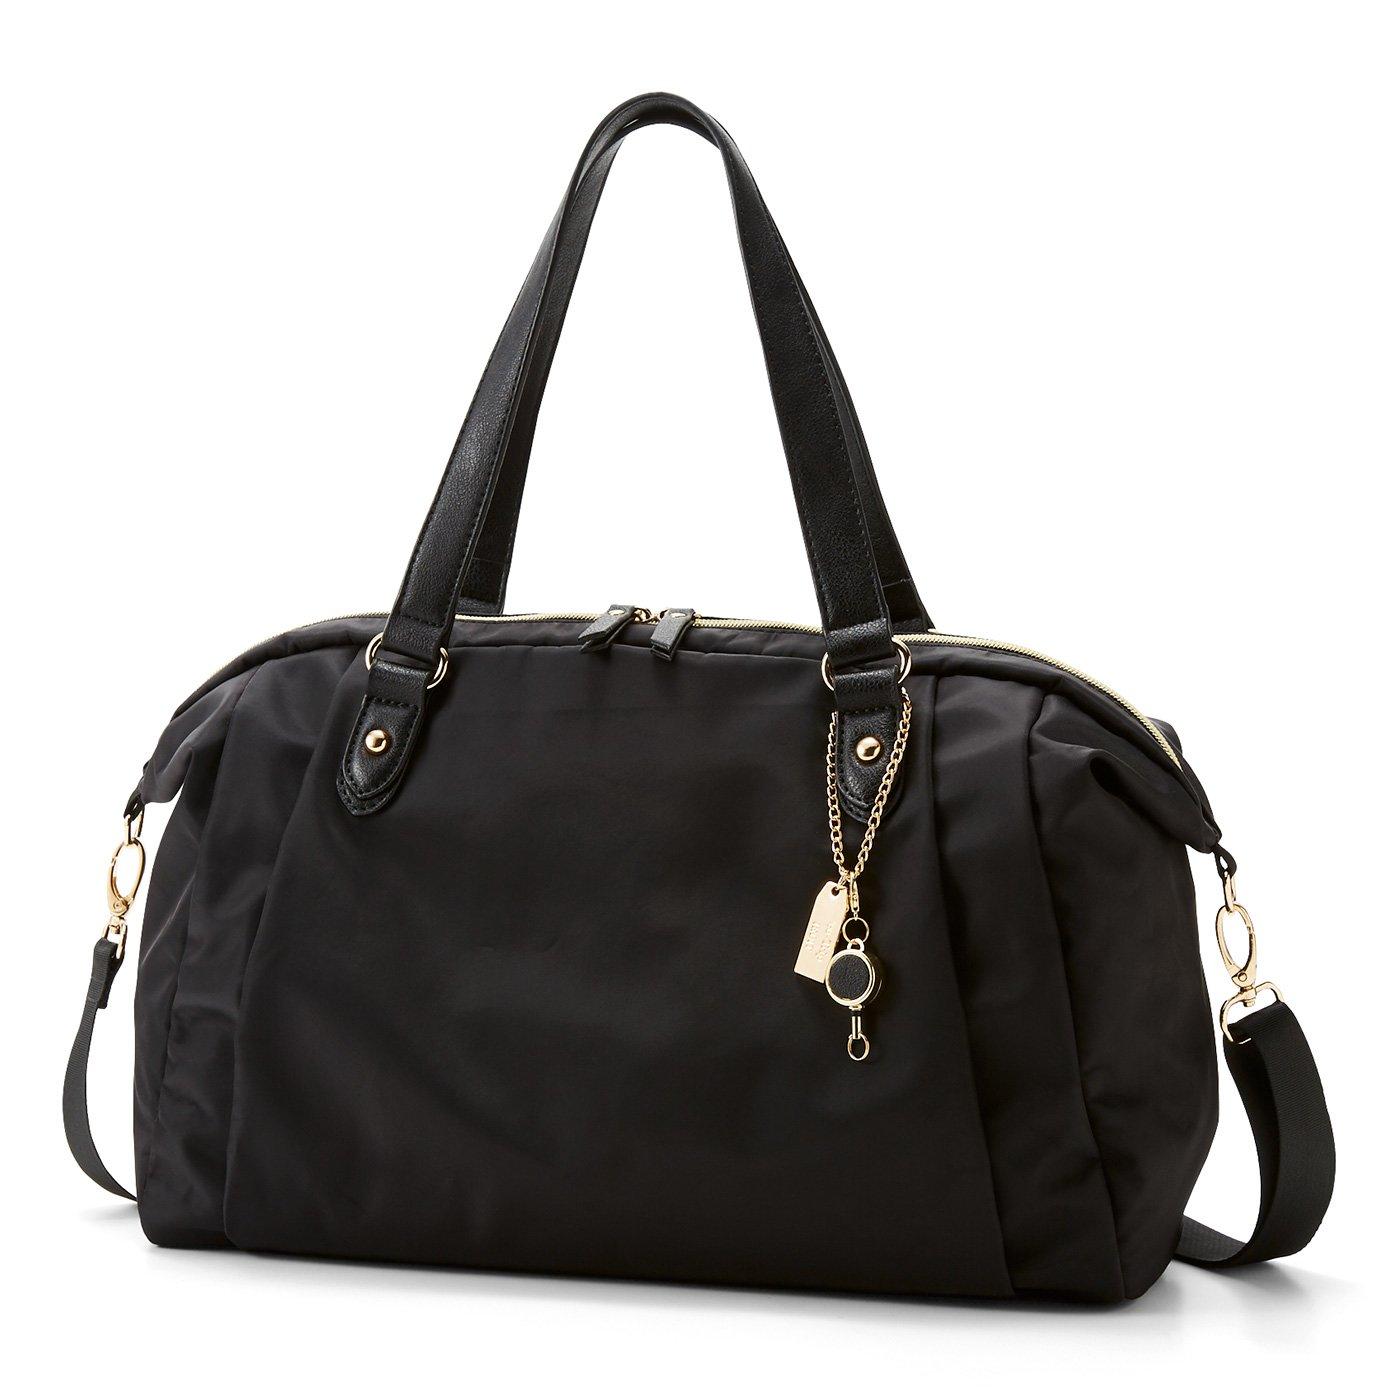 IEDIT[イディット] ことりっぷとコラボ 旅のプロのアイデアを詰め込んだ軽量バッグ〈ブラック〉